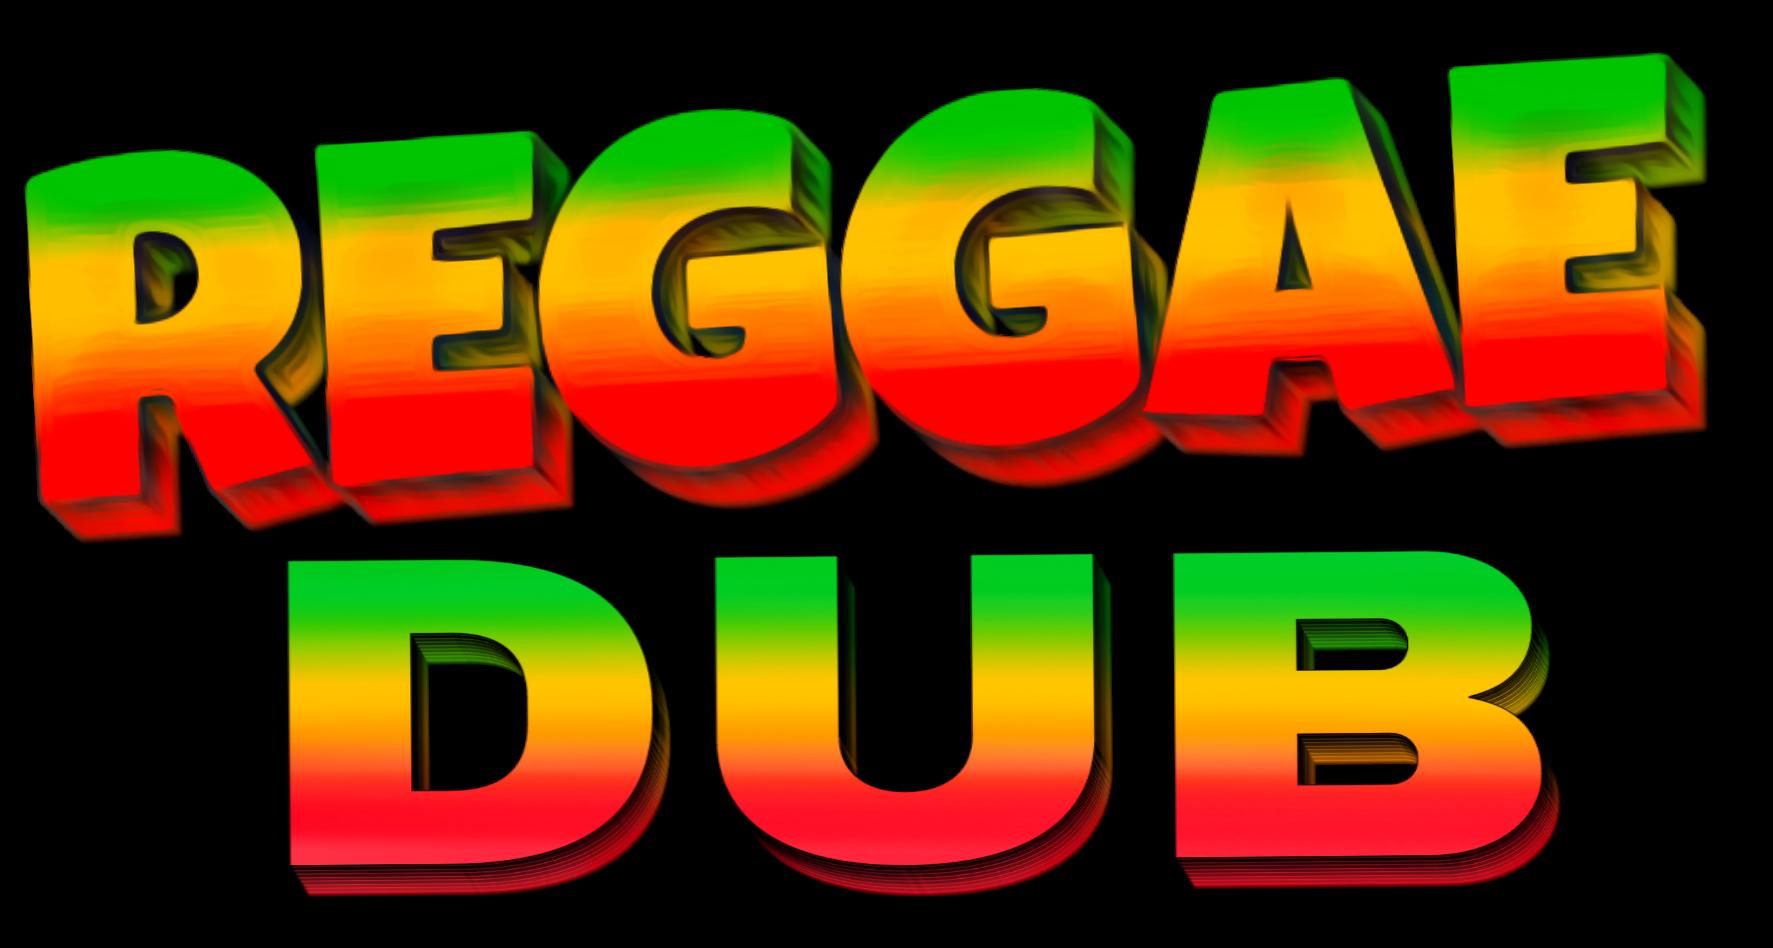 Stickers reggaedubsticker reggaedub reggaedub regaedub dub reggae dub reggae rasta vertjaunerouge greenyellowred dubrootsgirlcreation booom